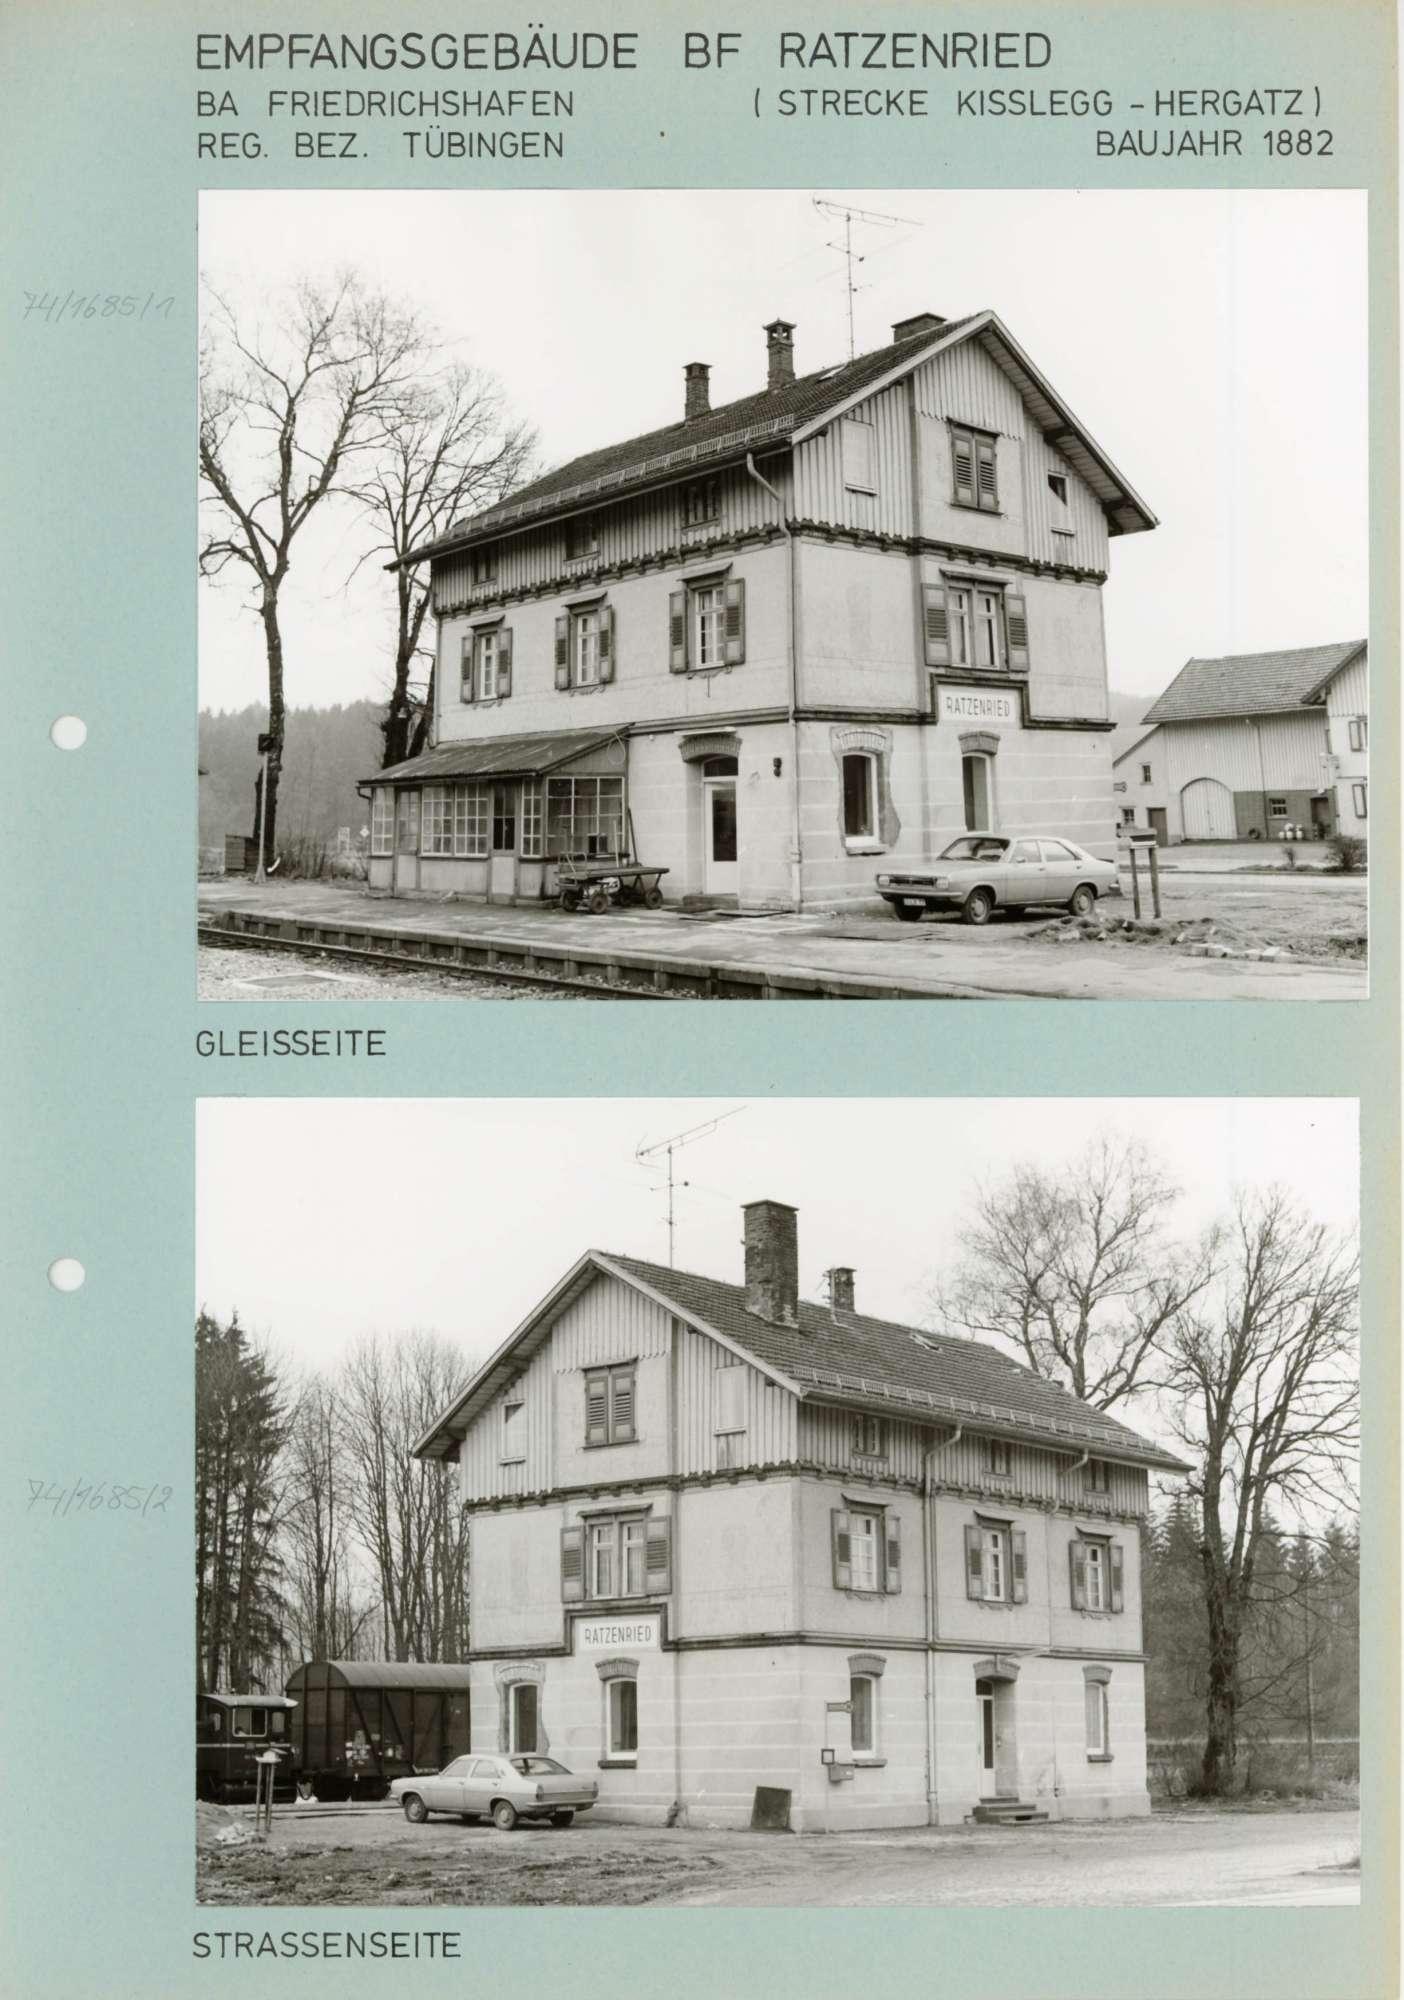 Ratzenried: 4 Fotos, Bild 1